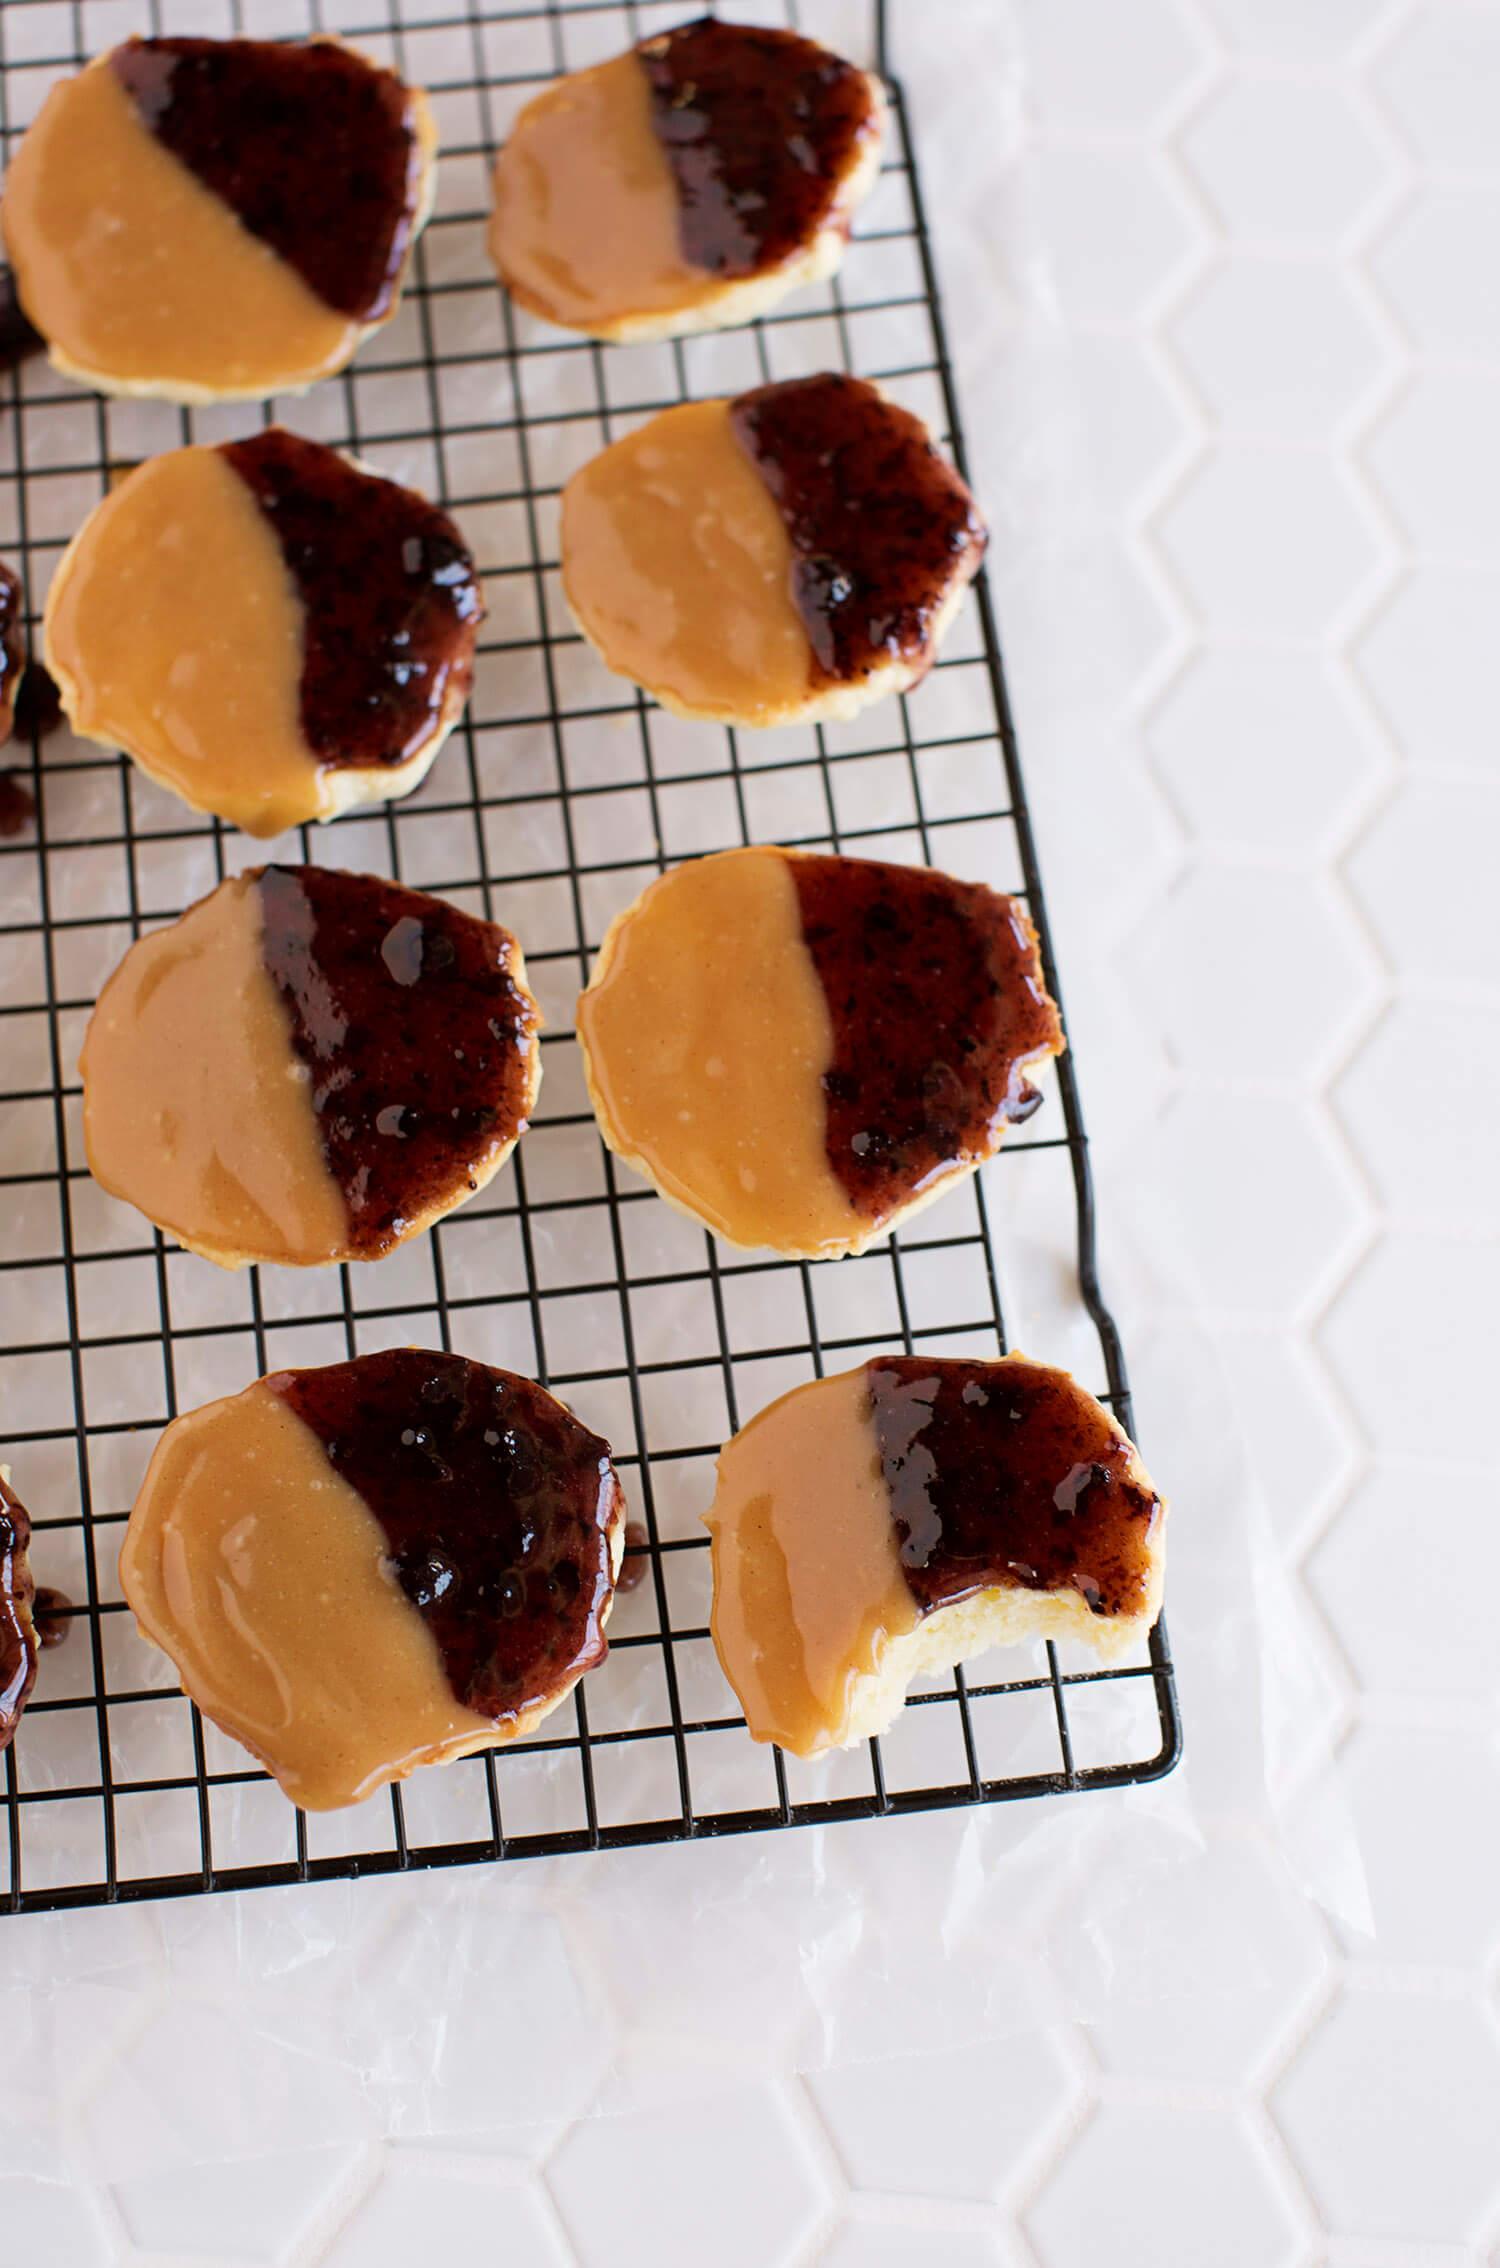 Peanut Butter & Jelly Cookies (via abeautifulmess.com)